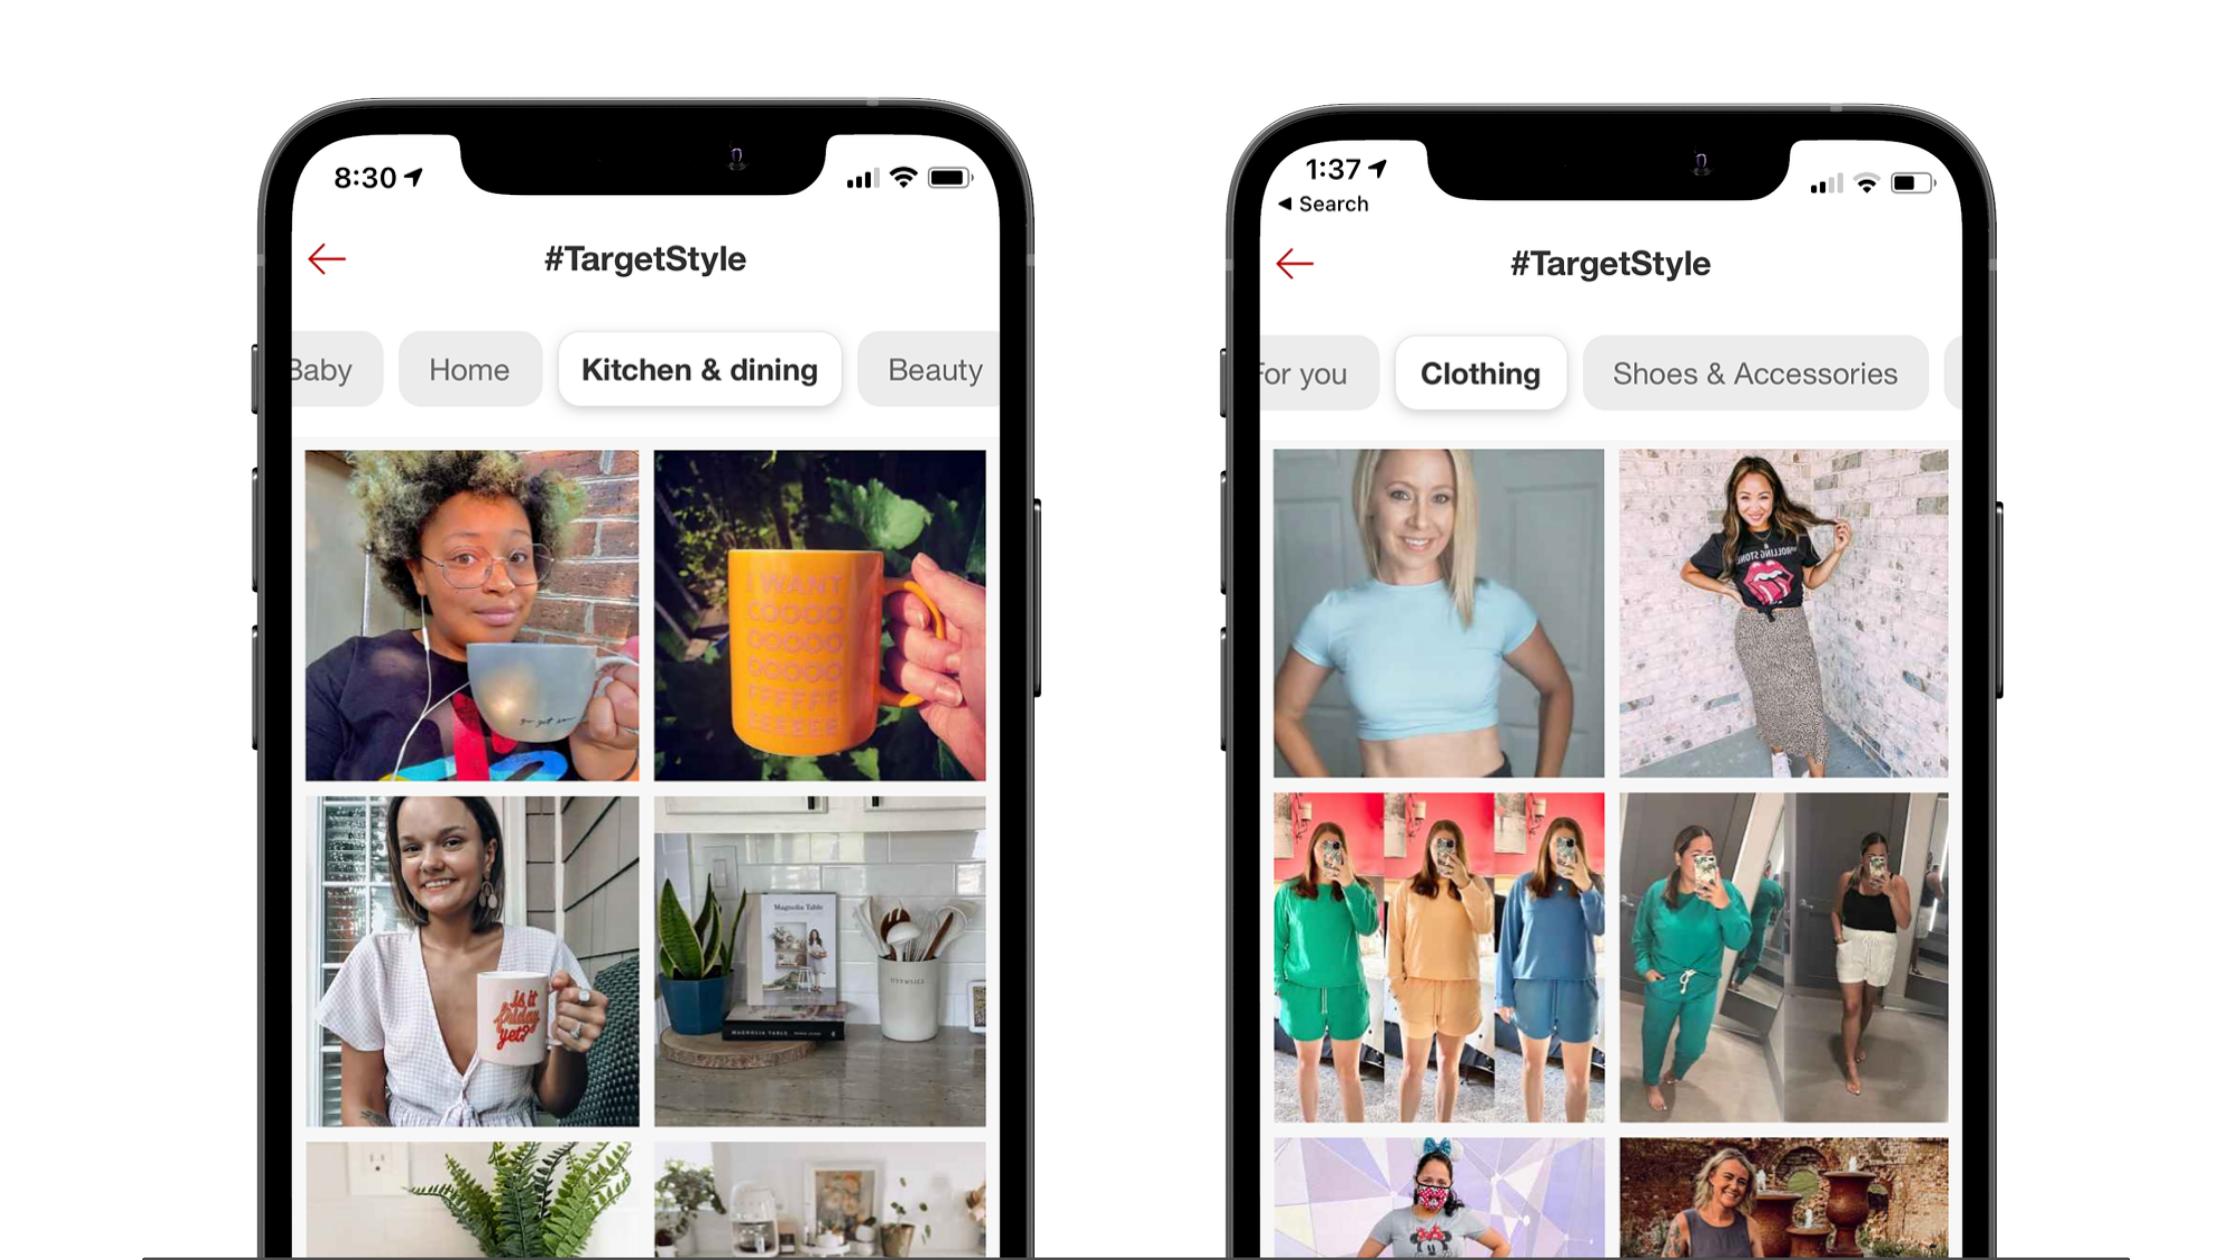 #TargetStyle User-Generated Content iPhones